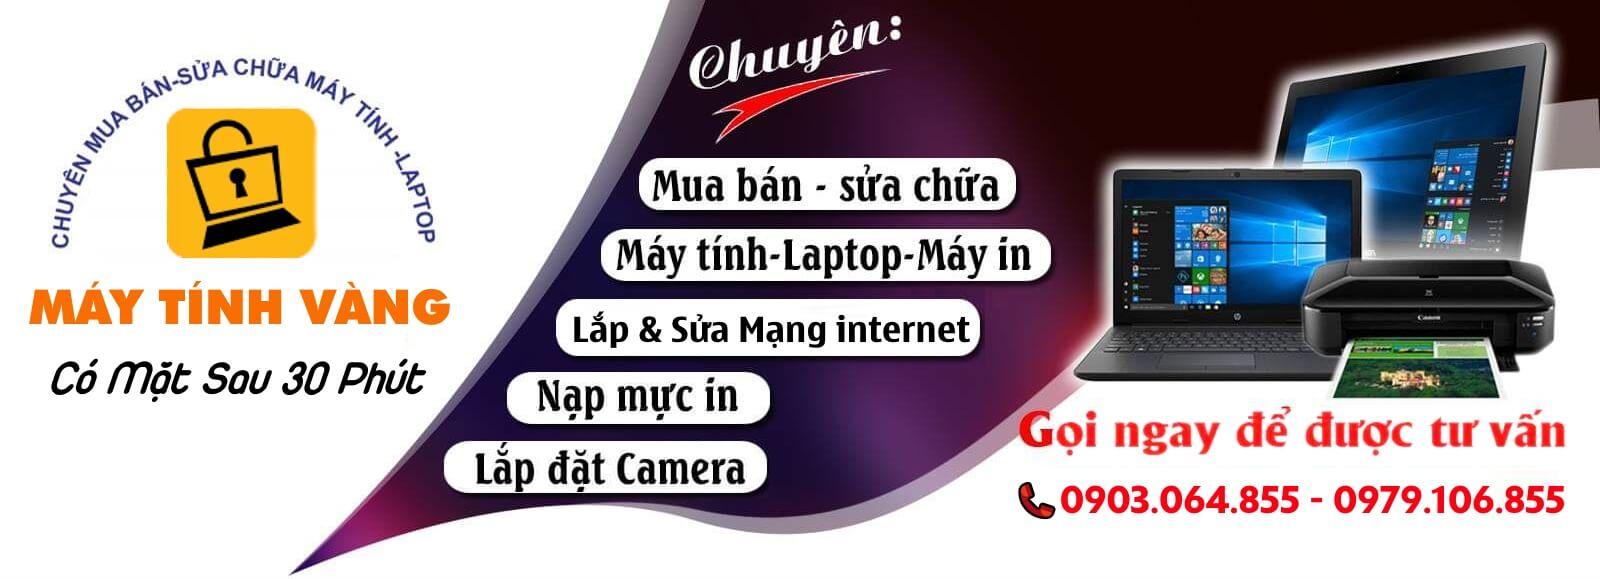 Dich Vu Cai Dat Phan Mem May Tinh Tai Nha TP HCM